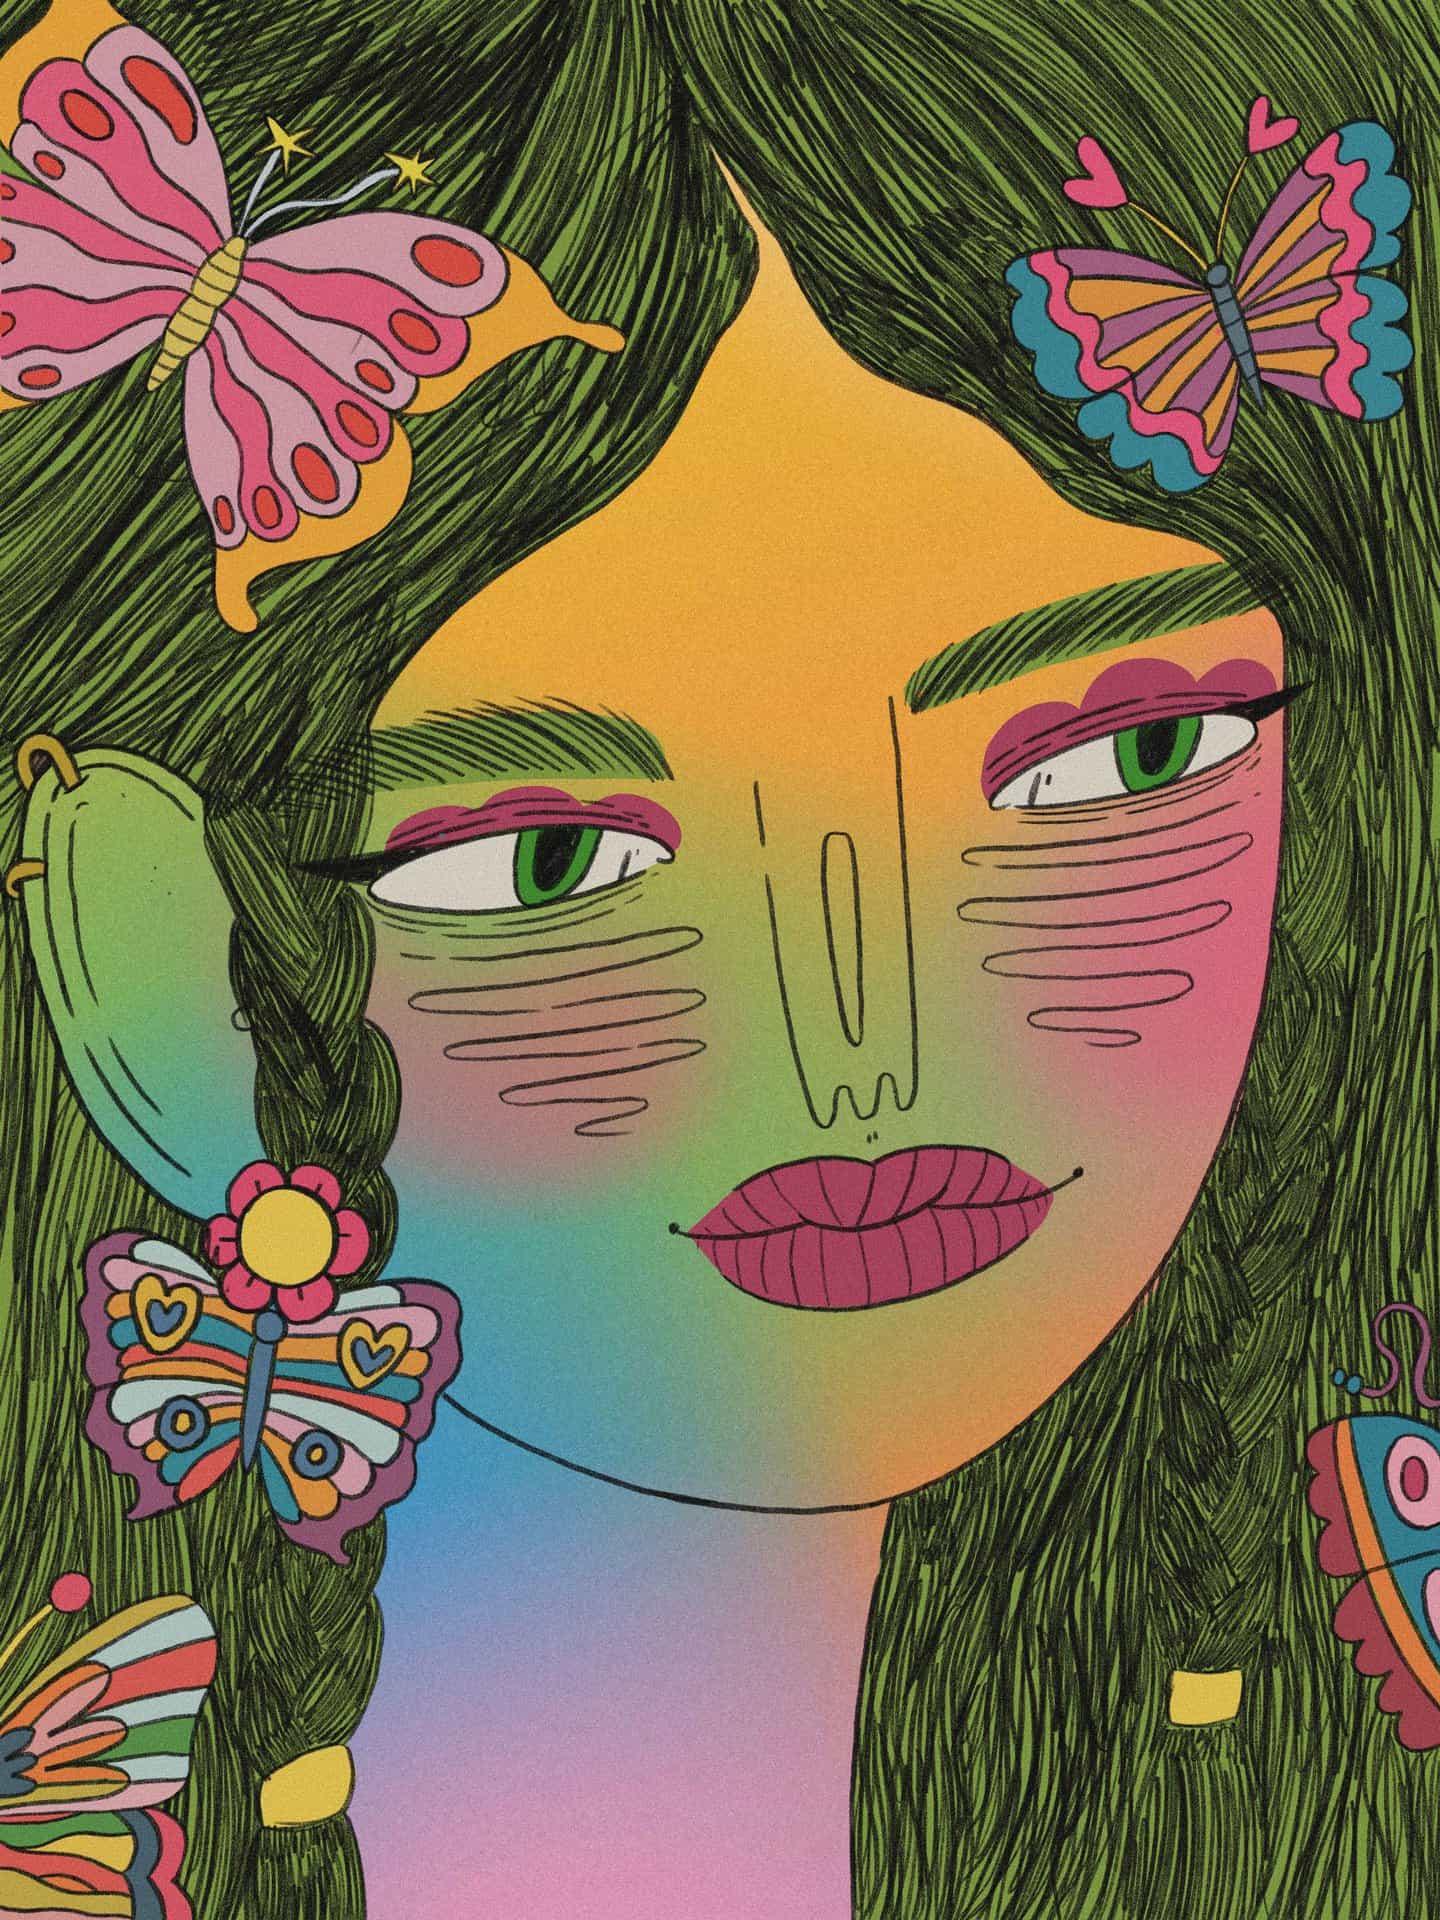 Ilustraciones de Doolittle (Eliza Williams): Butterfly Nymph (Copyright © Doolittle Illustrations, diciembre de 2020)